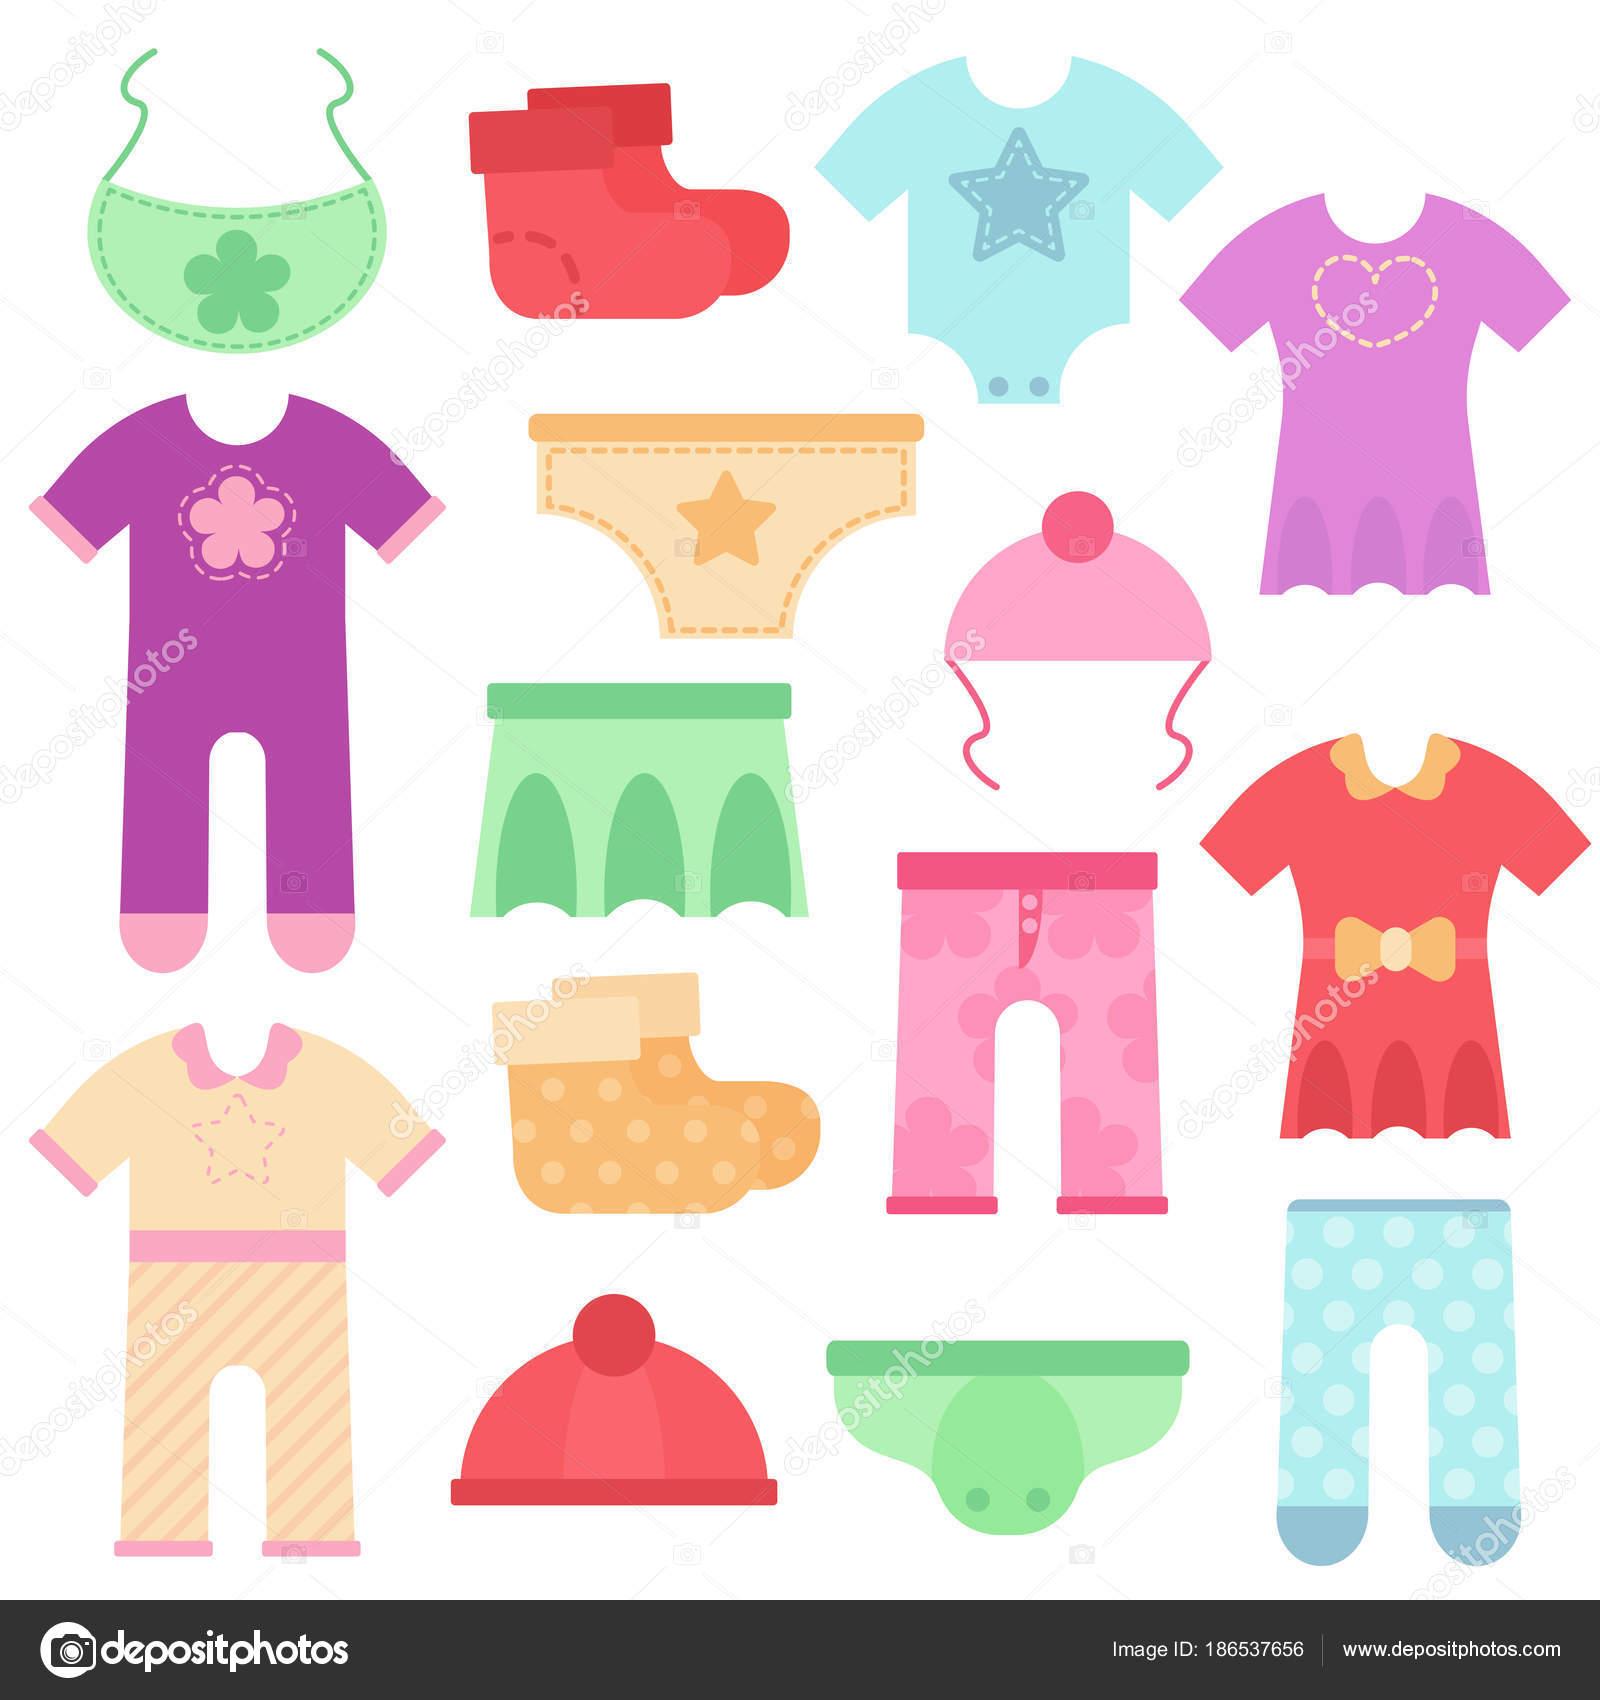 4eca348a2a3 Ρούχα του μωρού. Παιδιά πολύχρωμο και φωτεινό Κορμάκια και φόρμες για  αγόρια και κορίτσια. Εικονογράφηση διάνυσμα. Σετ εικονιδίων ενδυμάτων στην  επίπεδη ...